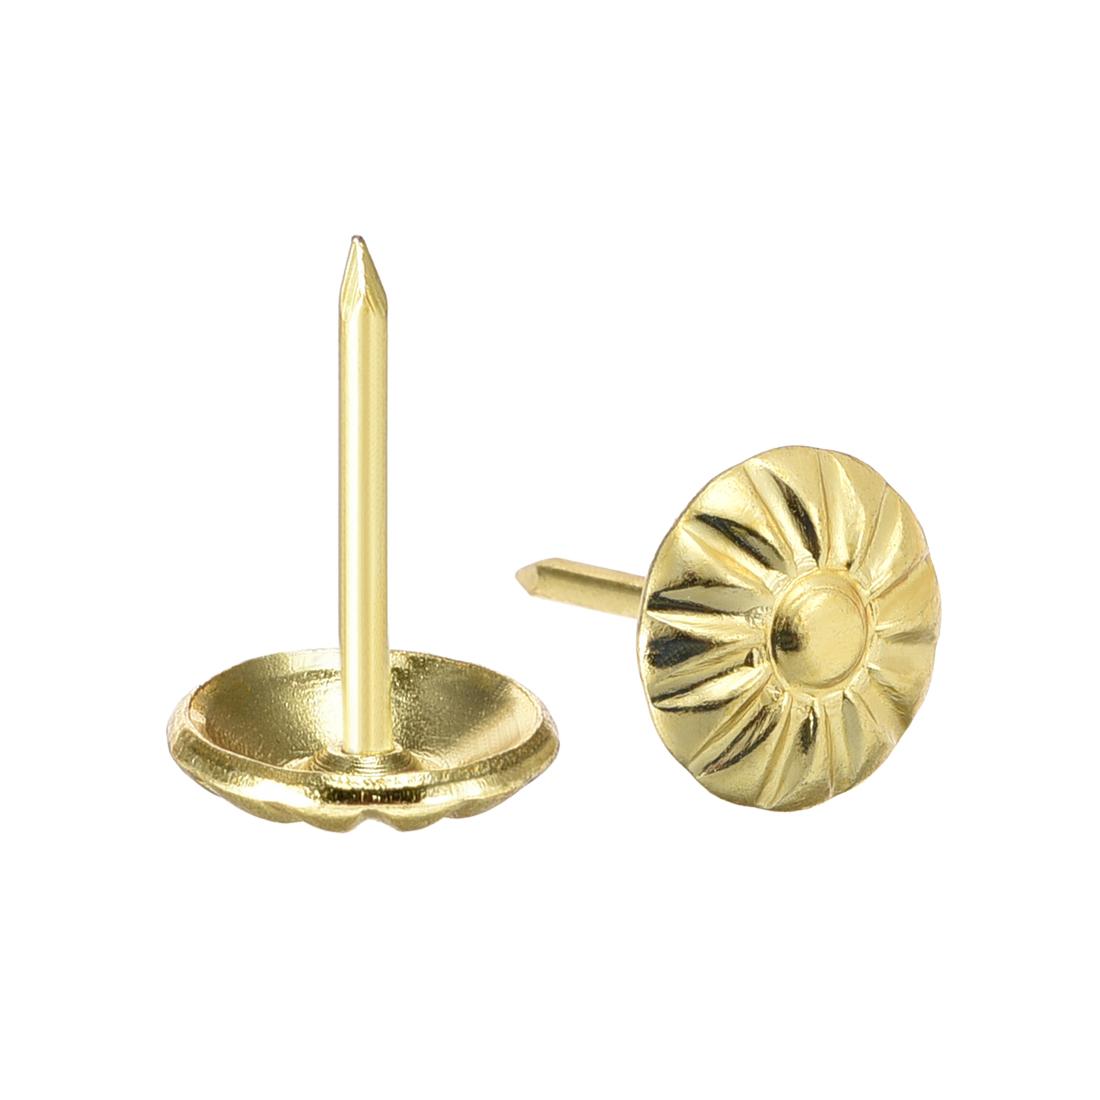 Upholstery Nails Tacks 11mm Dia 17mm Height Furniture Push Pins Gold Tone 50 Pcs